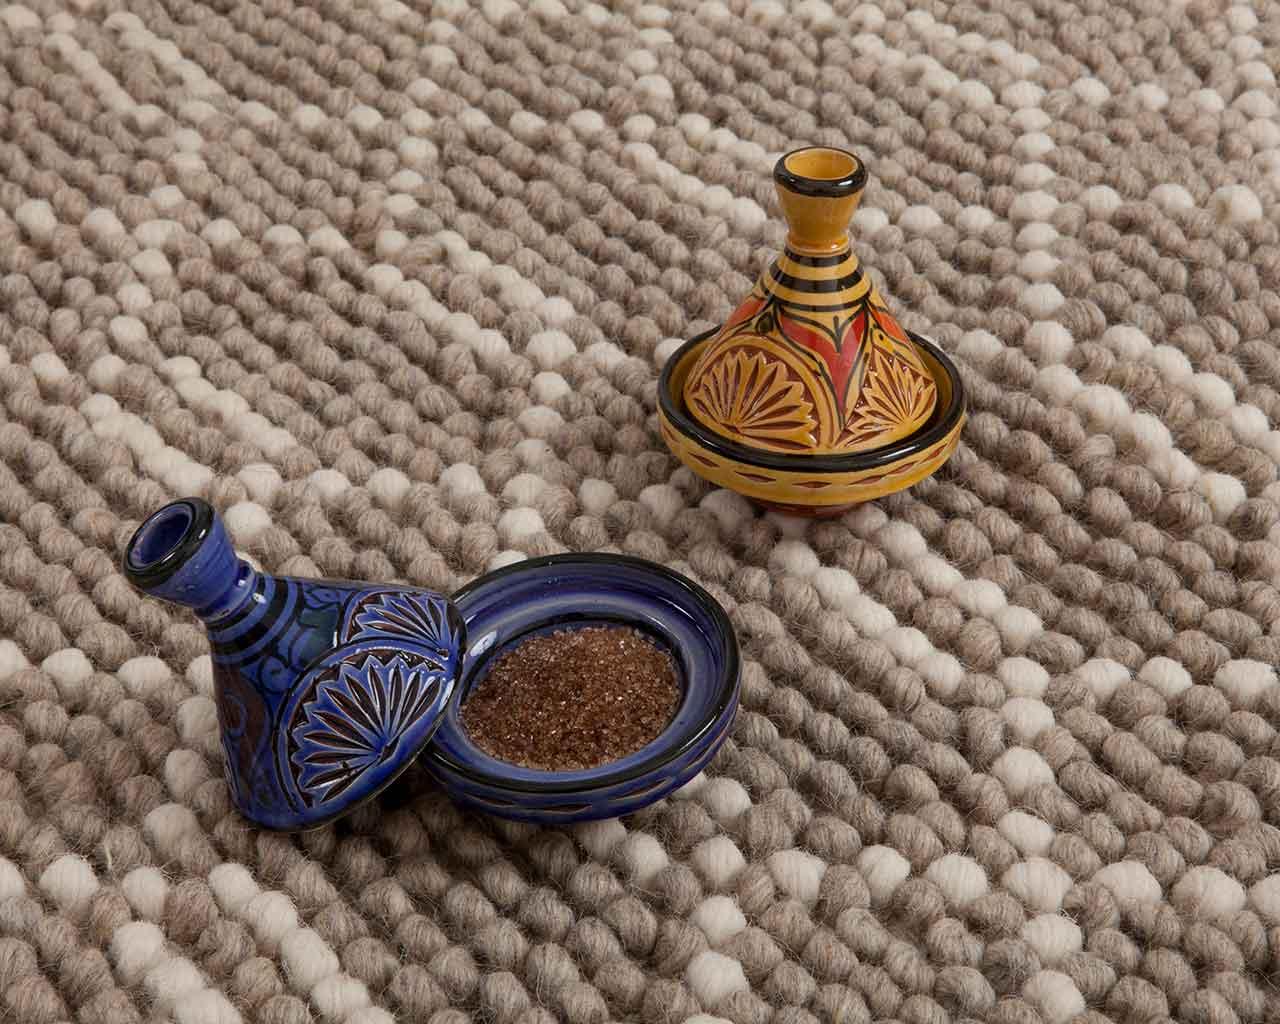 tappeti-boho-a-mano-tappeti-di-lana-anello-modelli-india